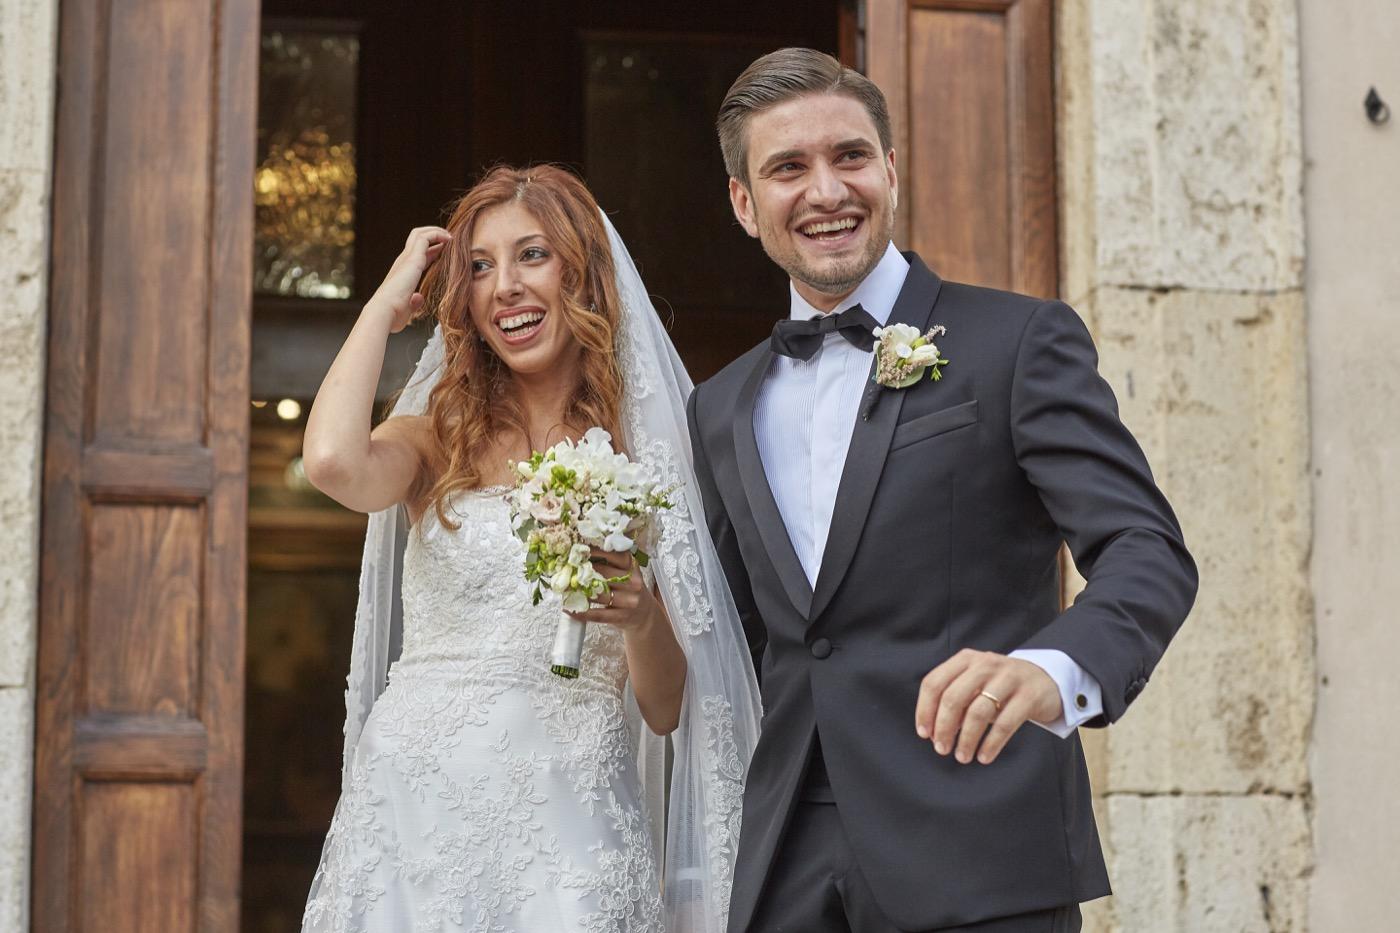 Claudio-Coppola-wedding-photographer-abbazia-7-frati-piegaro-57